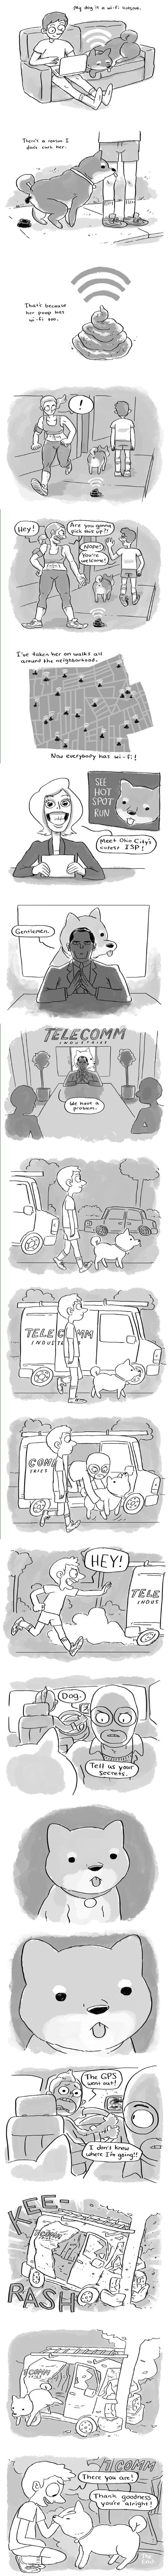 dogs wi-fi funny web comics - 7934861312